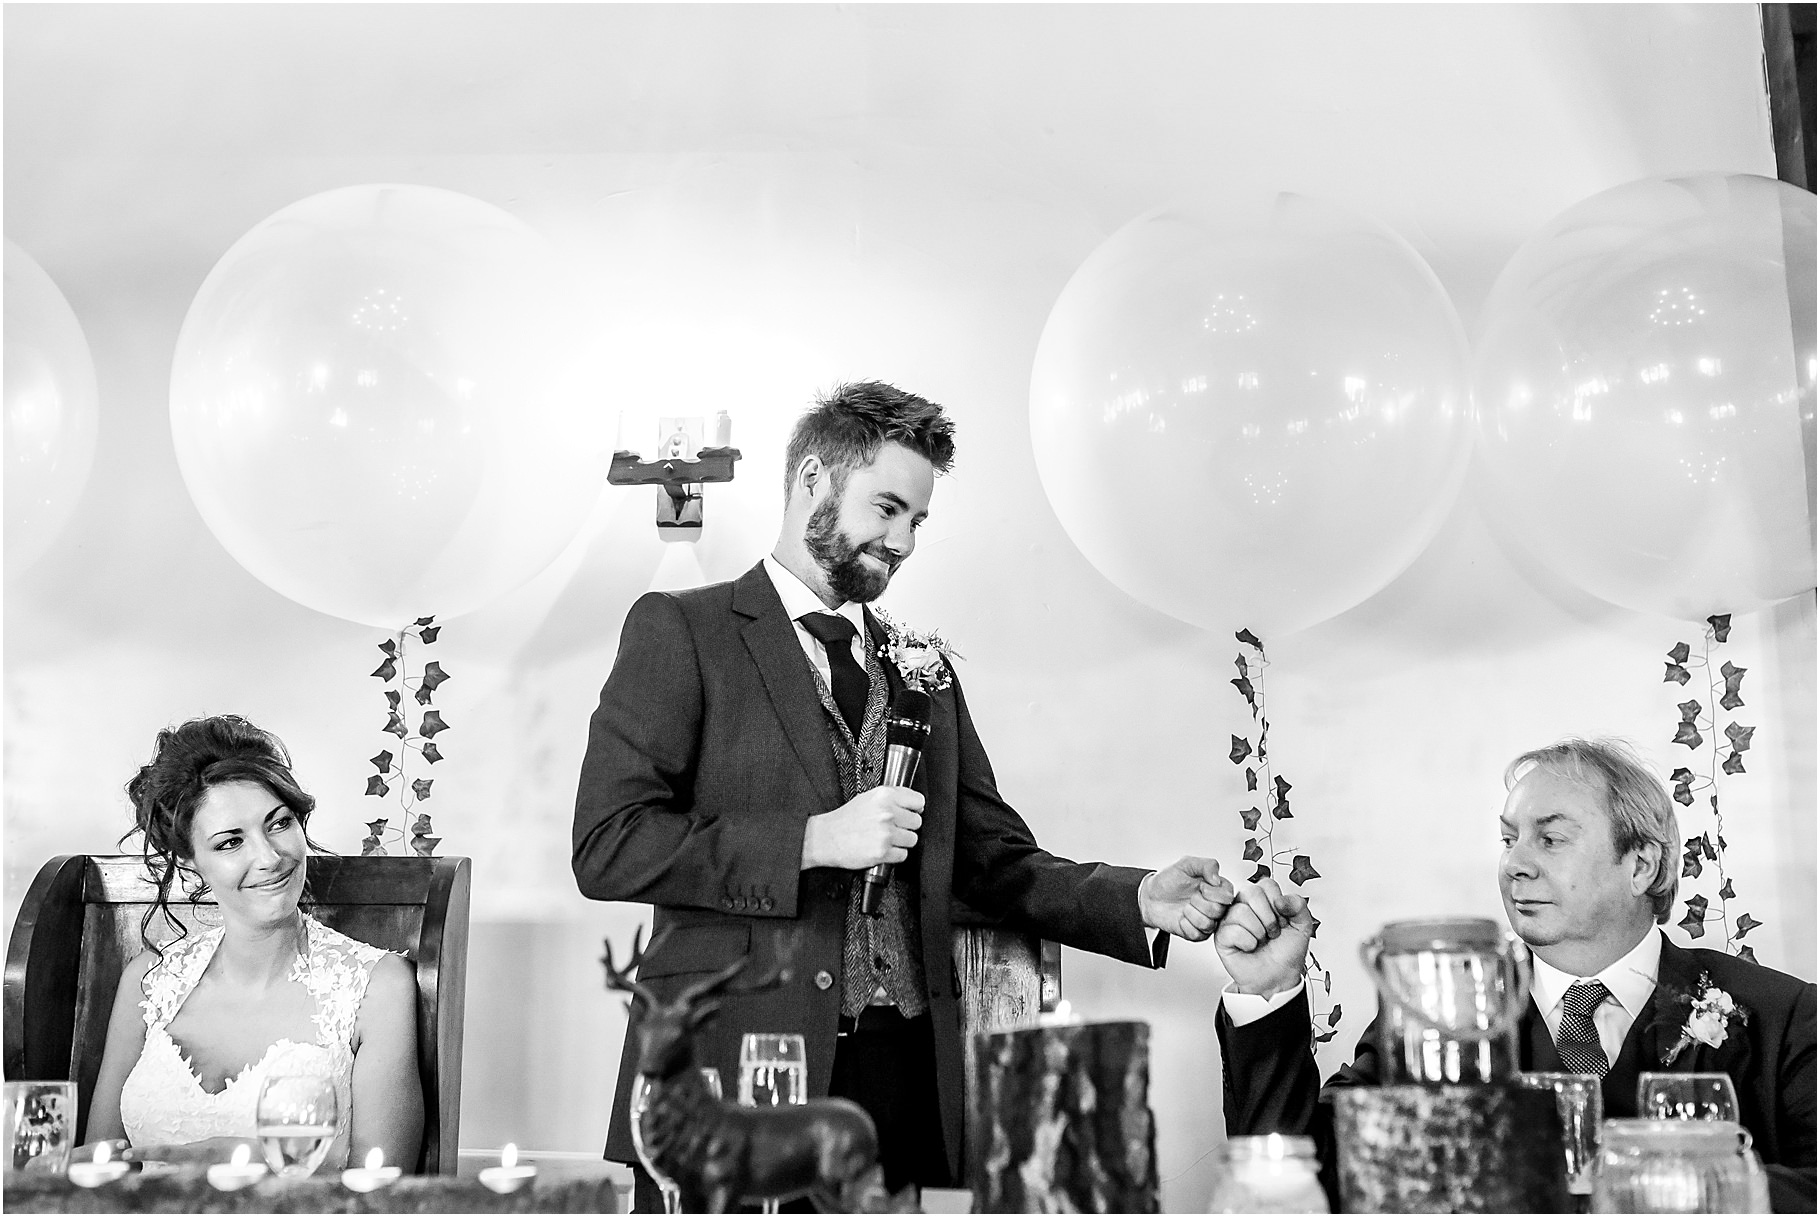 dan-wootton-photography-2017-weddings-171.jpg